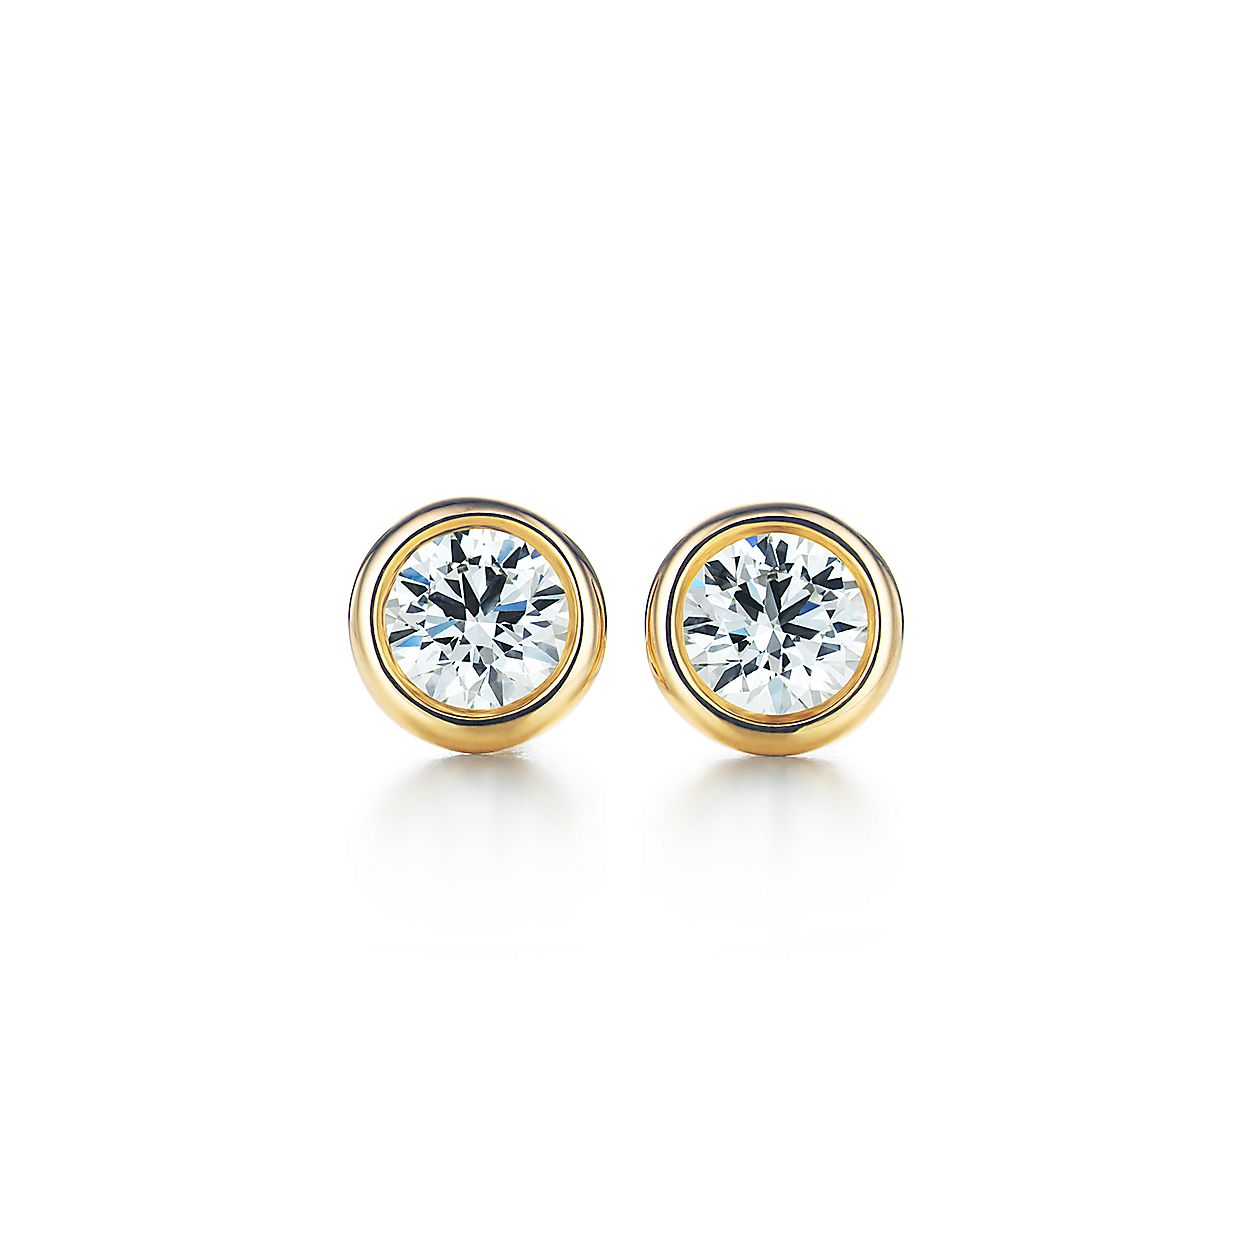 662669adb Elsa Peretti® Diamonds by the Yard® earrings in 18k gold.   Tiffany ...